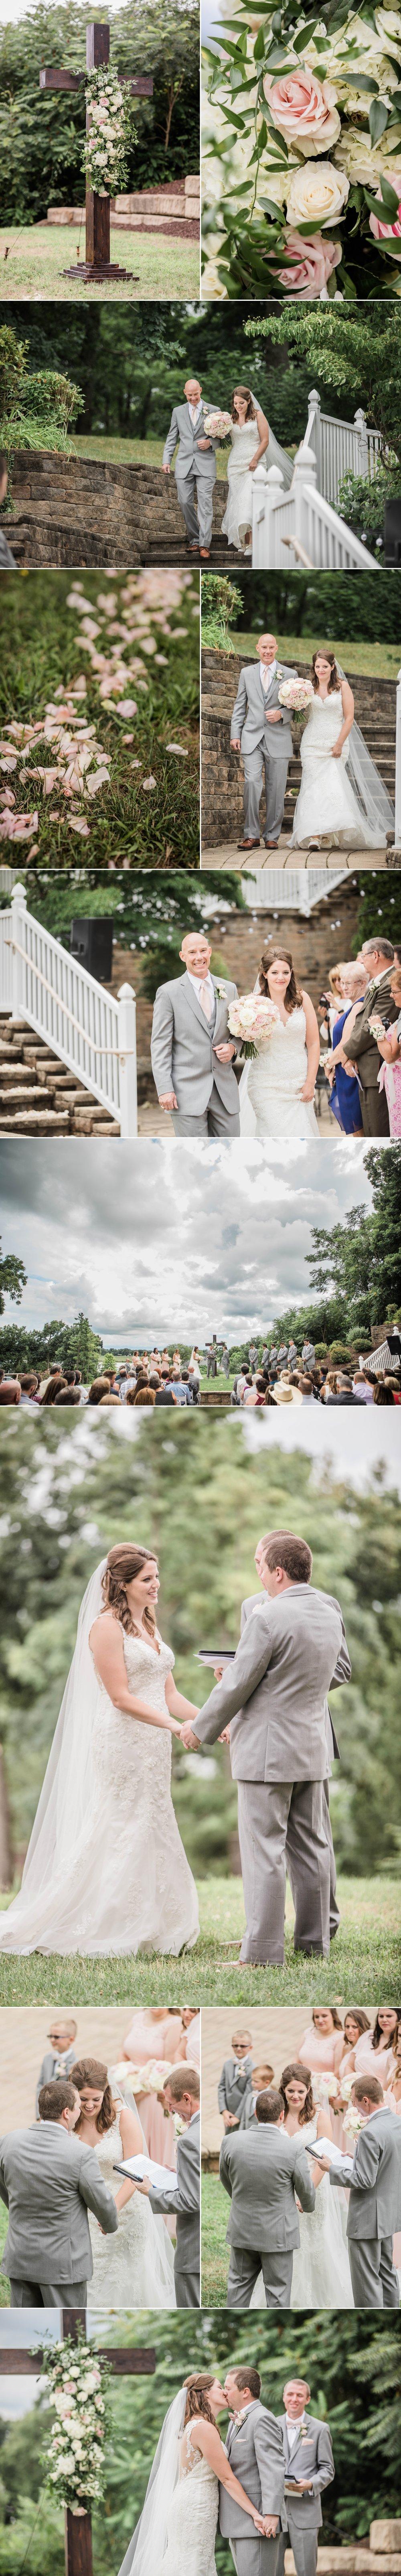 lake wawasee oakwood resort wedding indiana bride groom hilltop ceremony